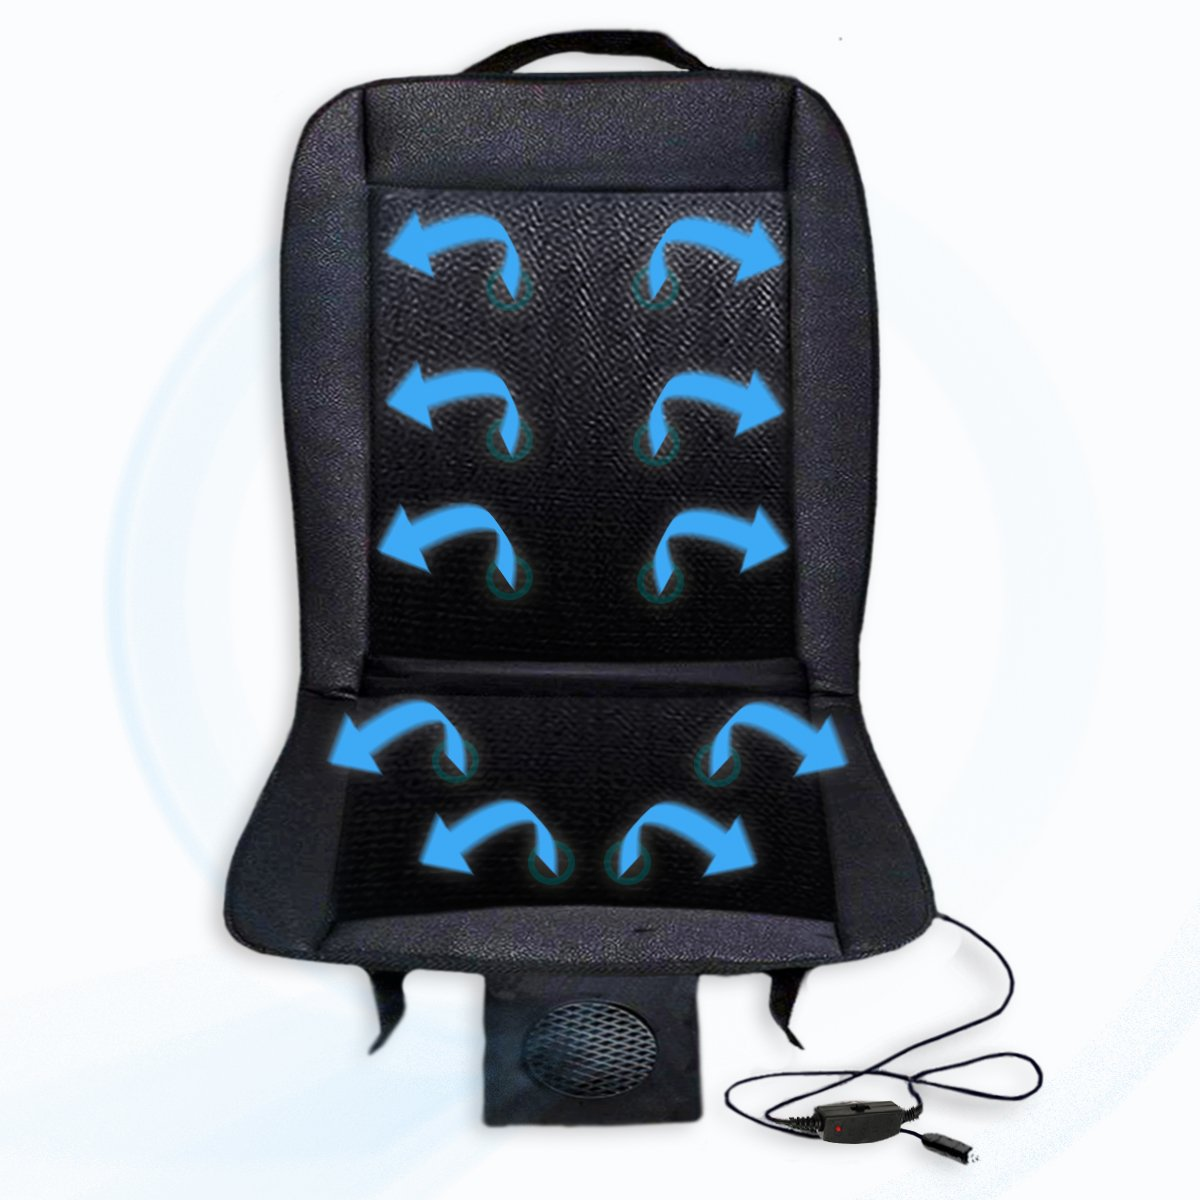 Zento Deals 12V Automotive Adjustable Cooling Car Cushion SE46